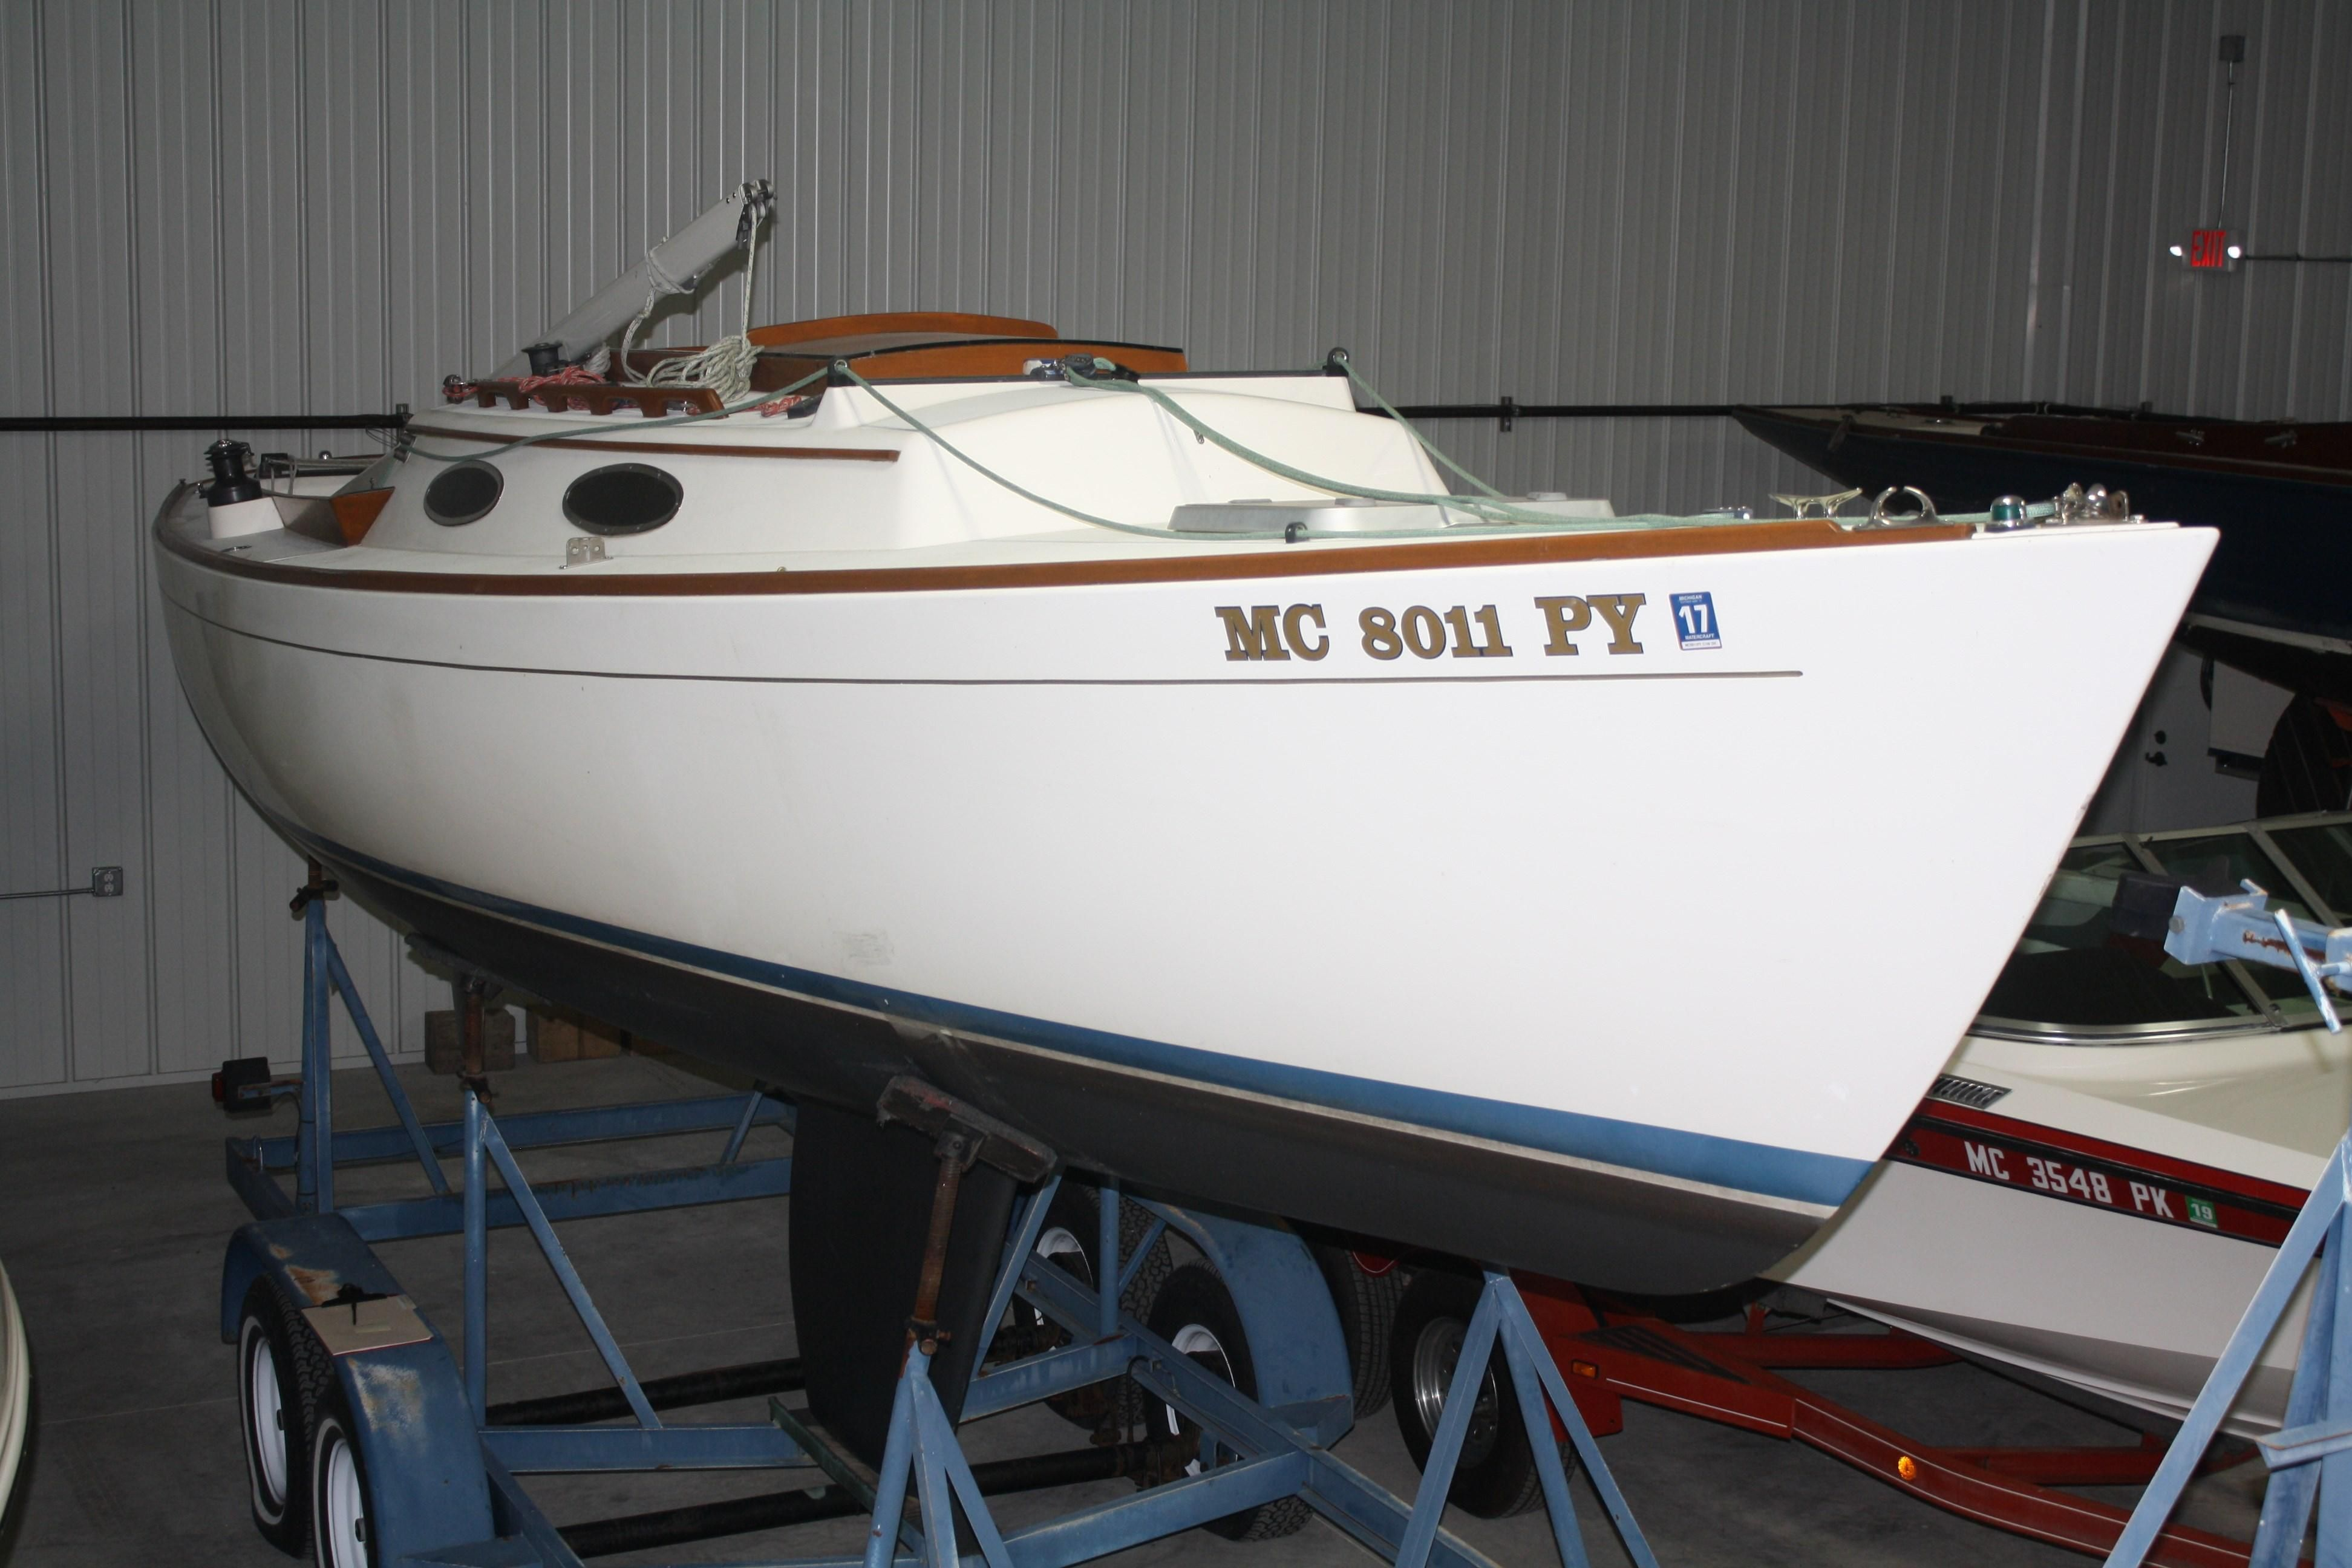 1994 Alerion Express 28 Sail Boat For Sale